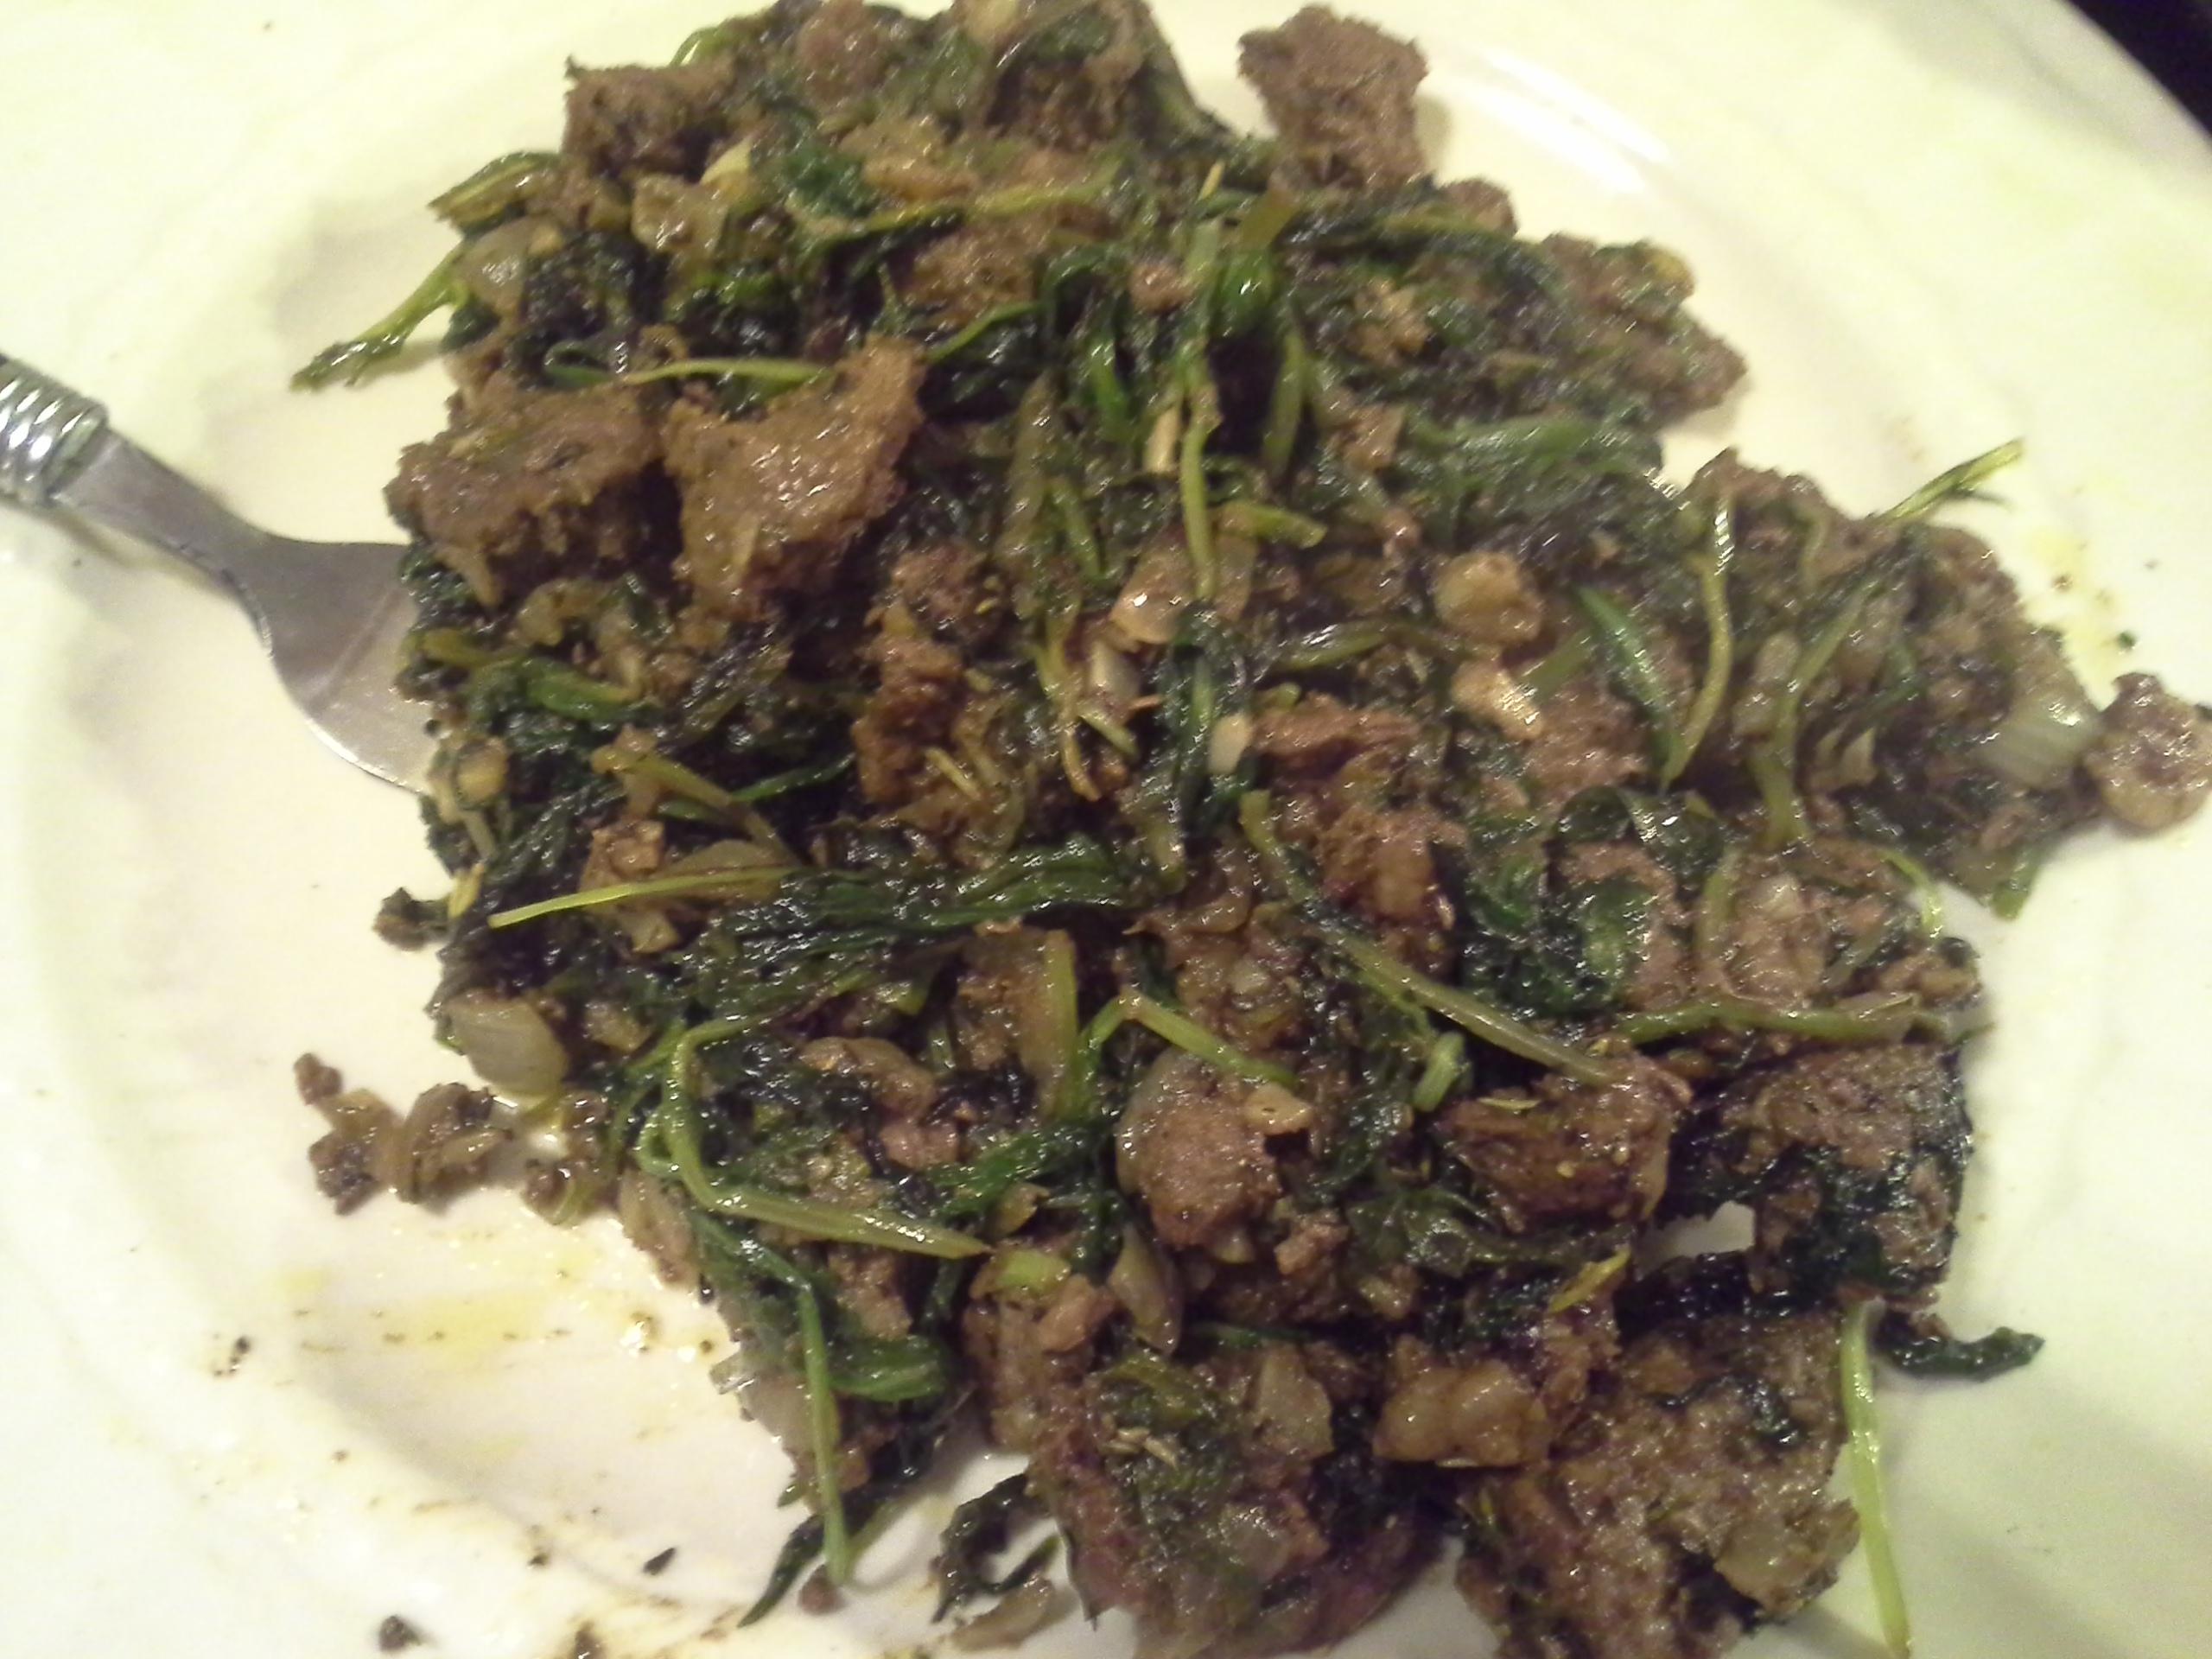 Dinner: 10:40 p.m. | 12.5 oz. steak, greens mix, 1/2 sweet onion, 4 cloves garlic, 2 Tbsp. coconut oil, herbs & spices